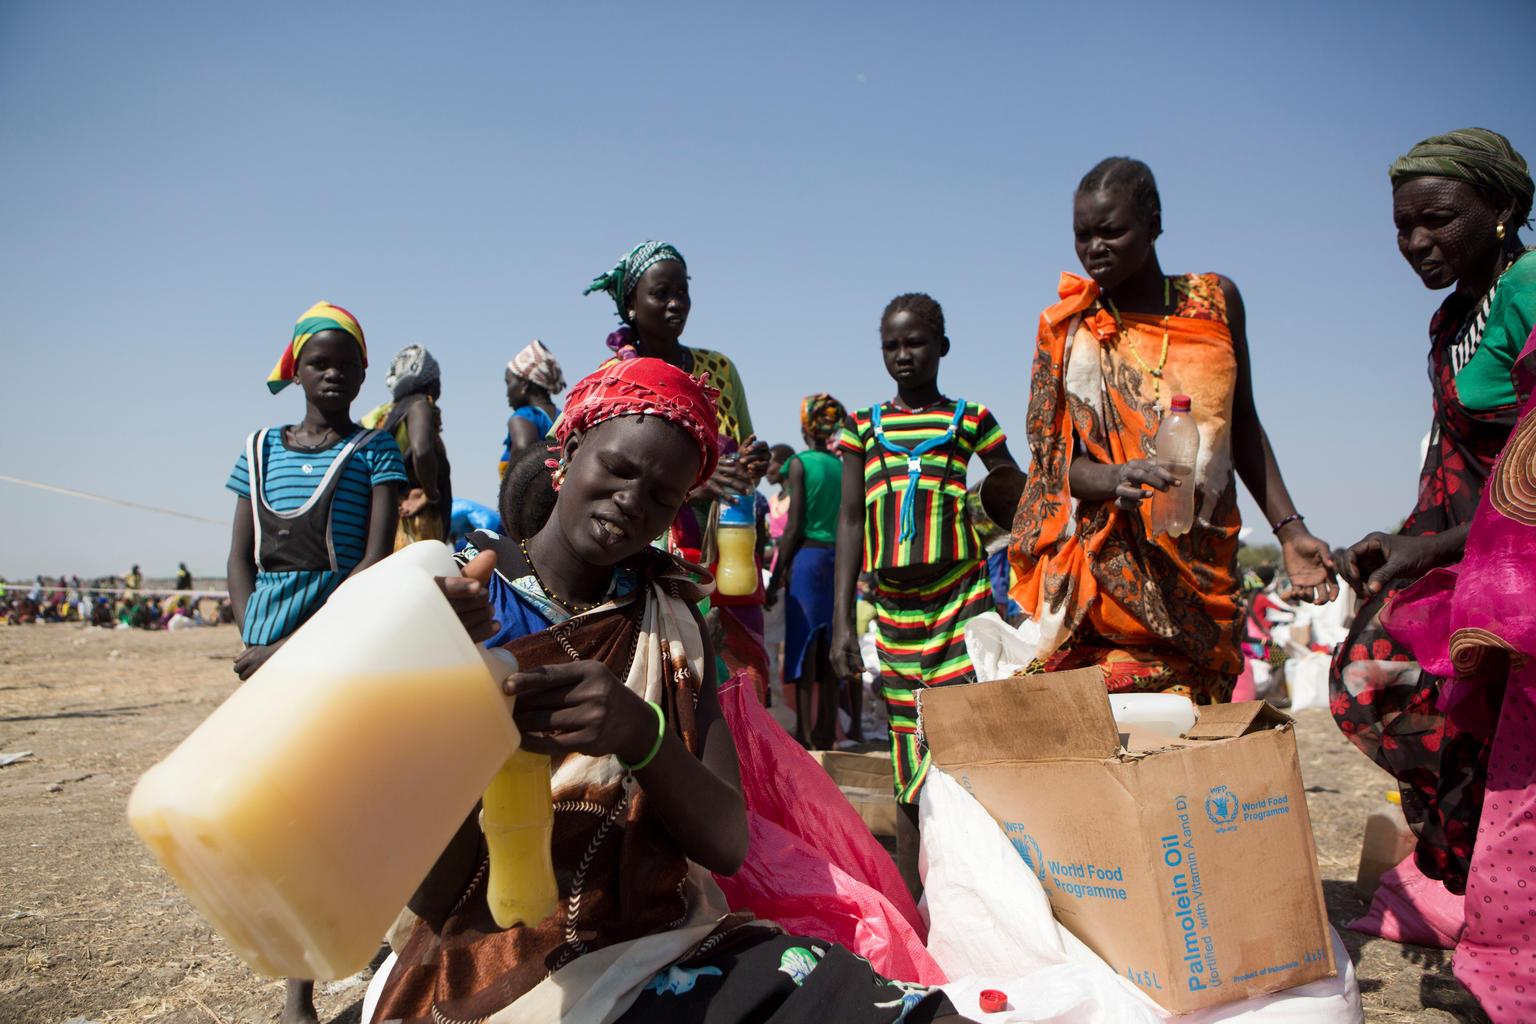 © UNICEF/UN0156706/Prinsloo